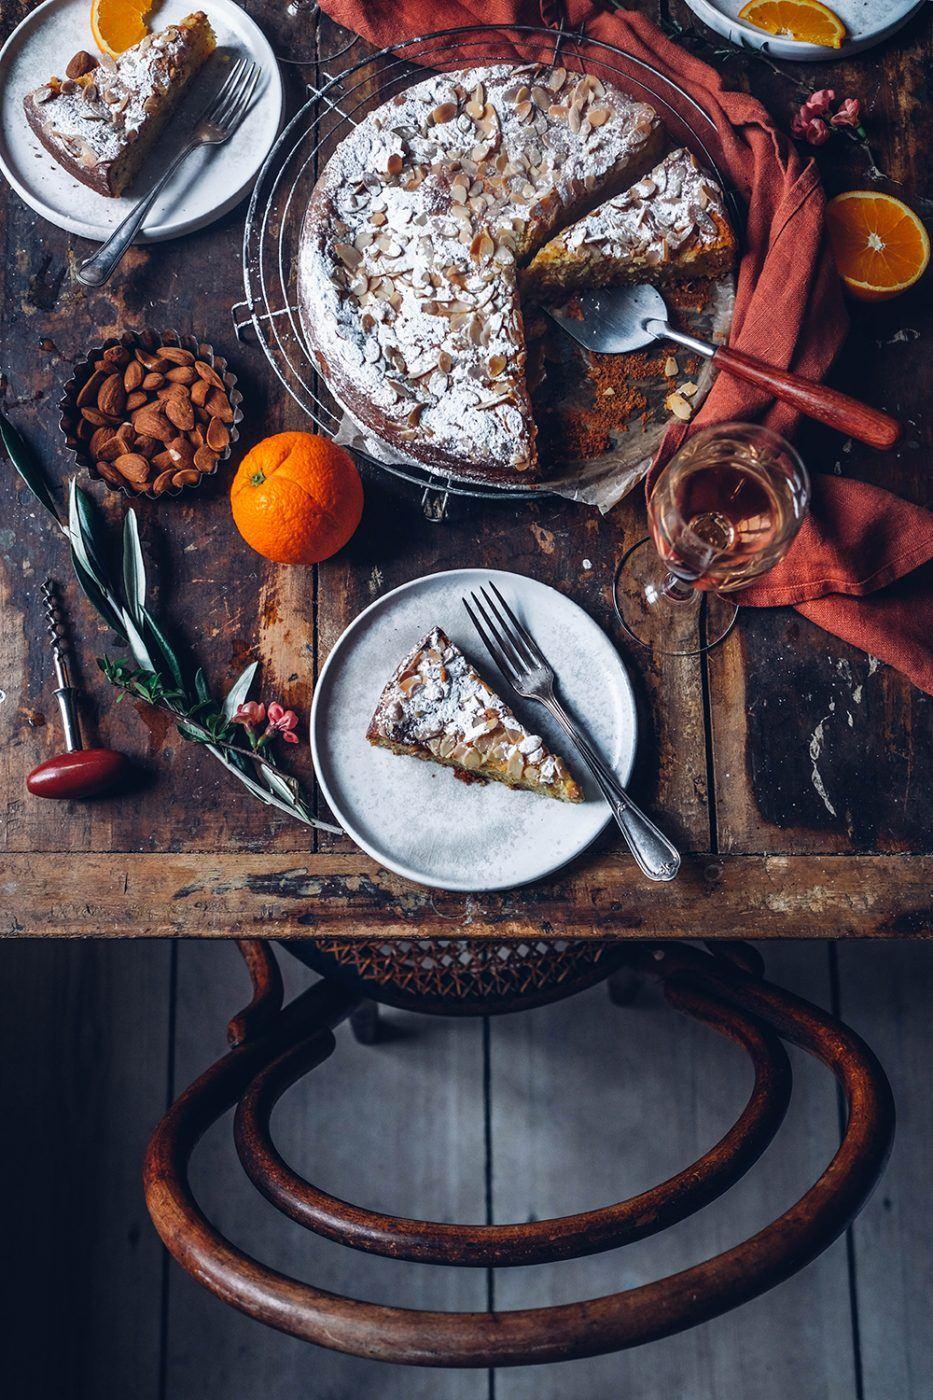 Image for Gluten-free Orange Almond Ricotta Cake